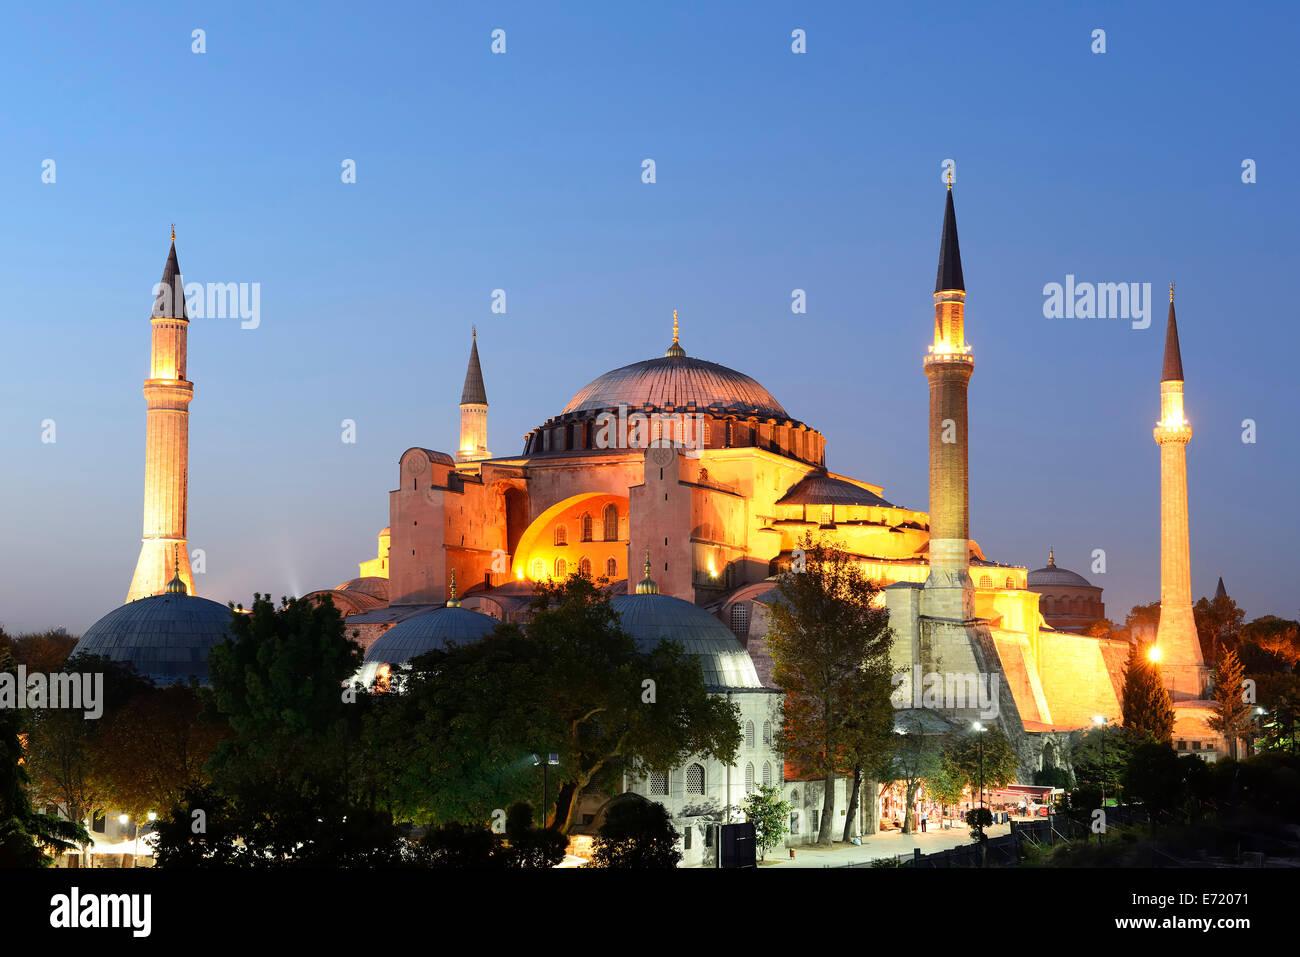 Hagia Sophia, Ayasofya, UNESCO World Heritage Site, European side, Istanbul, Turkey Stock Photo